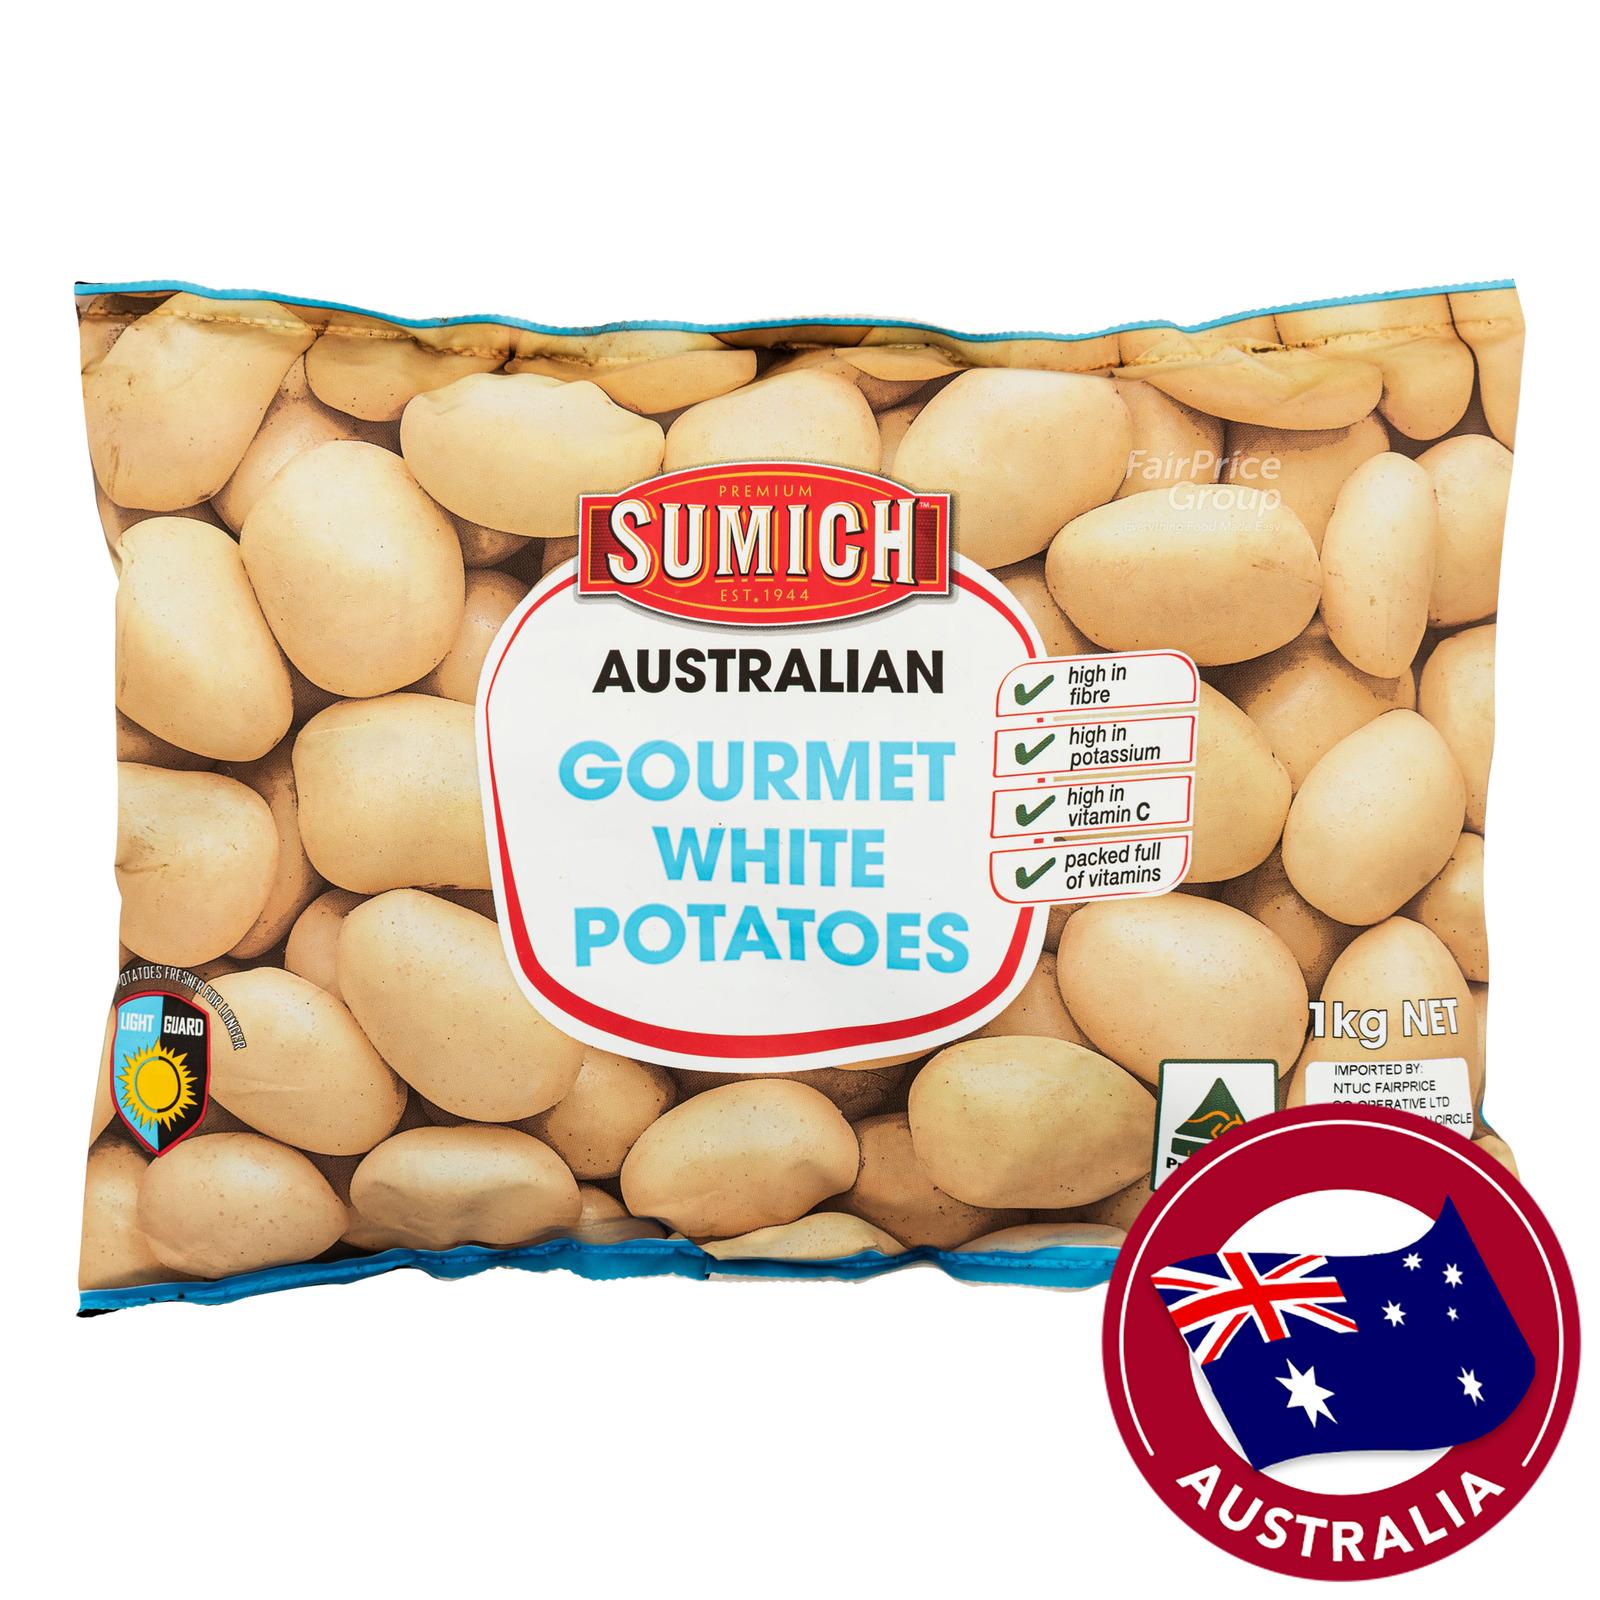 Sumich Autralian Gourmet White Potatoes